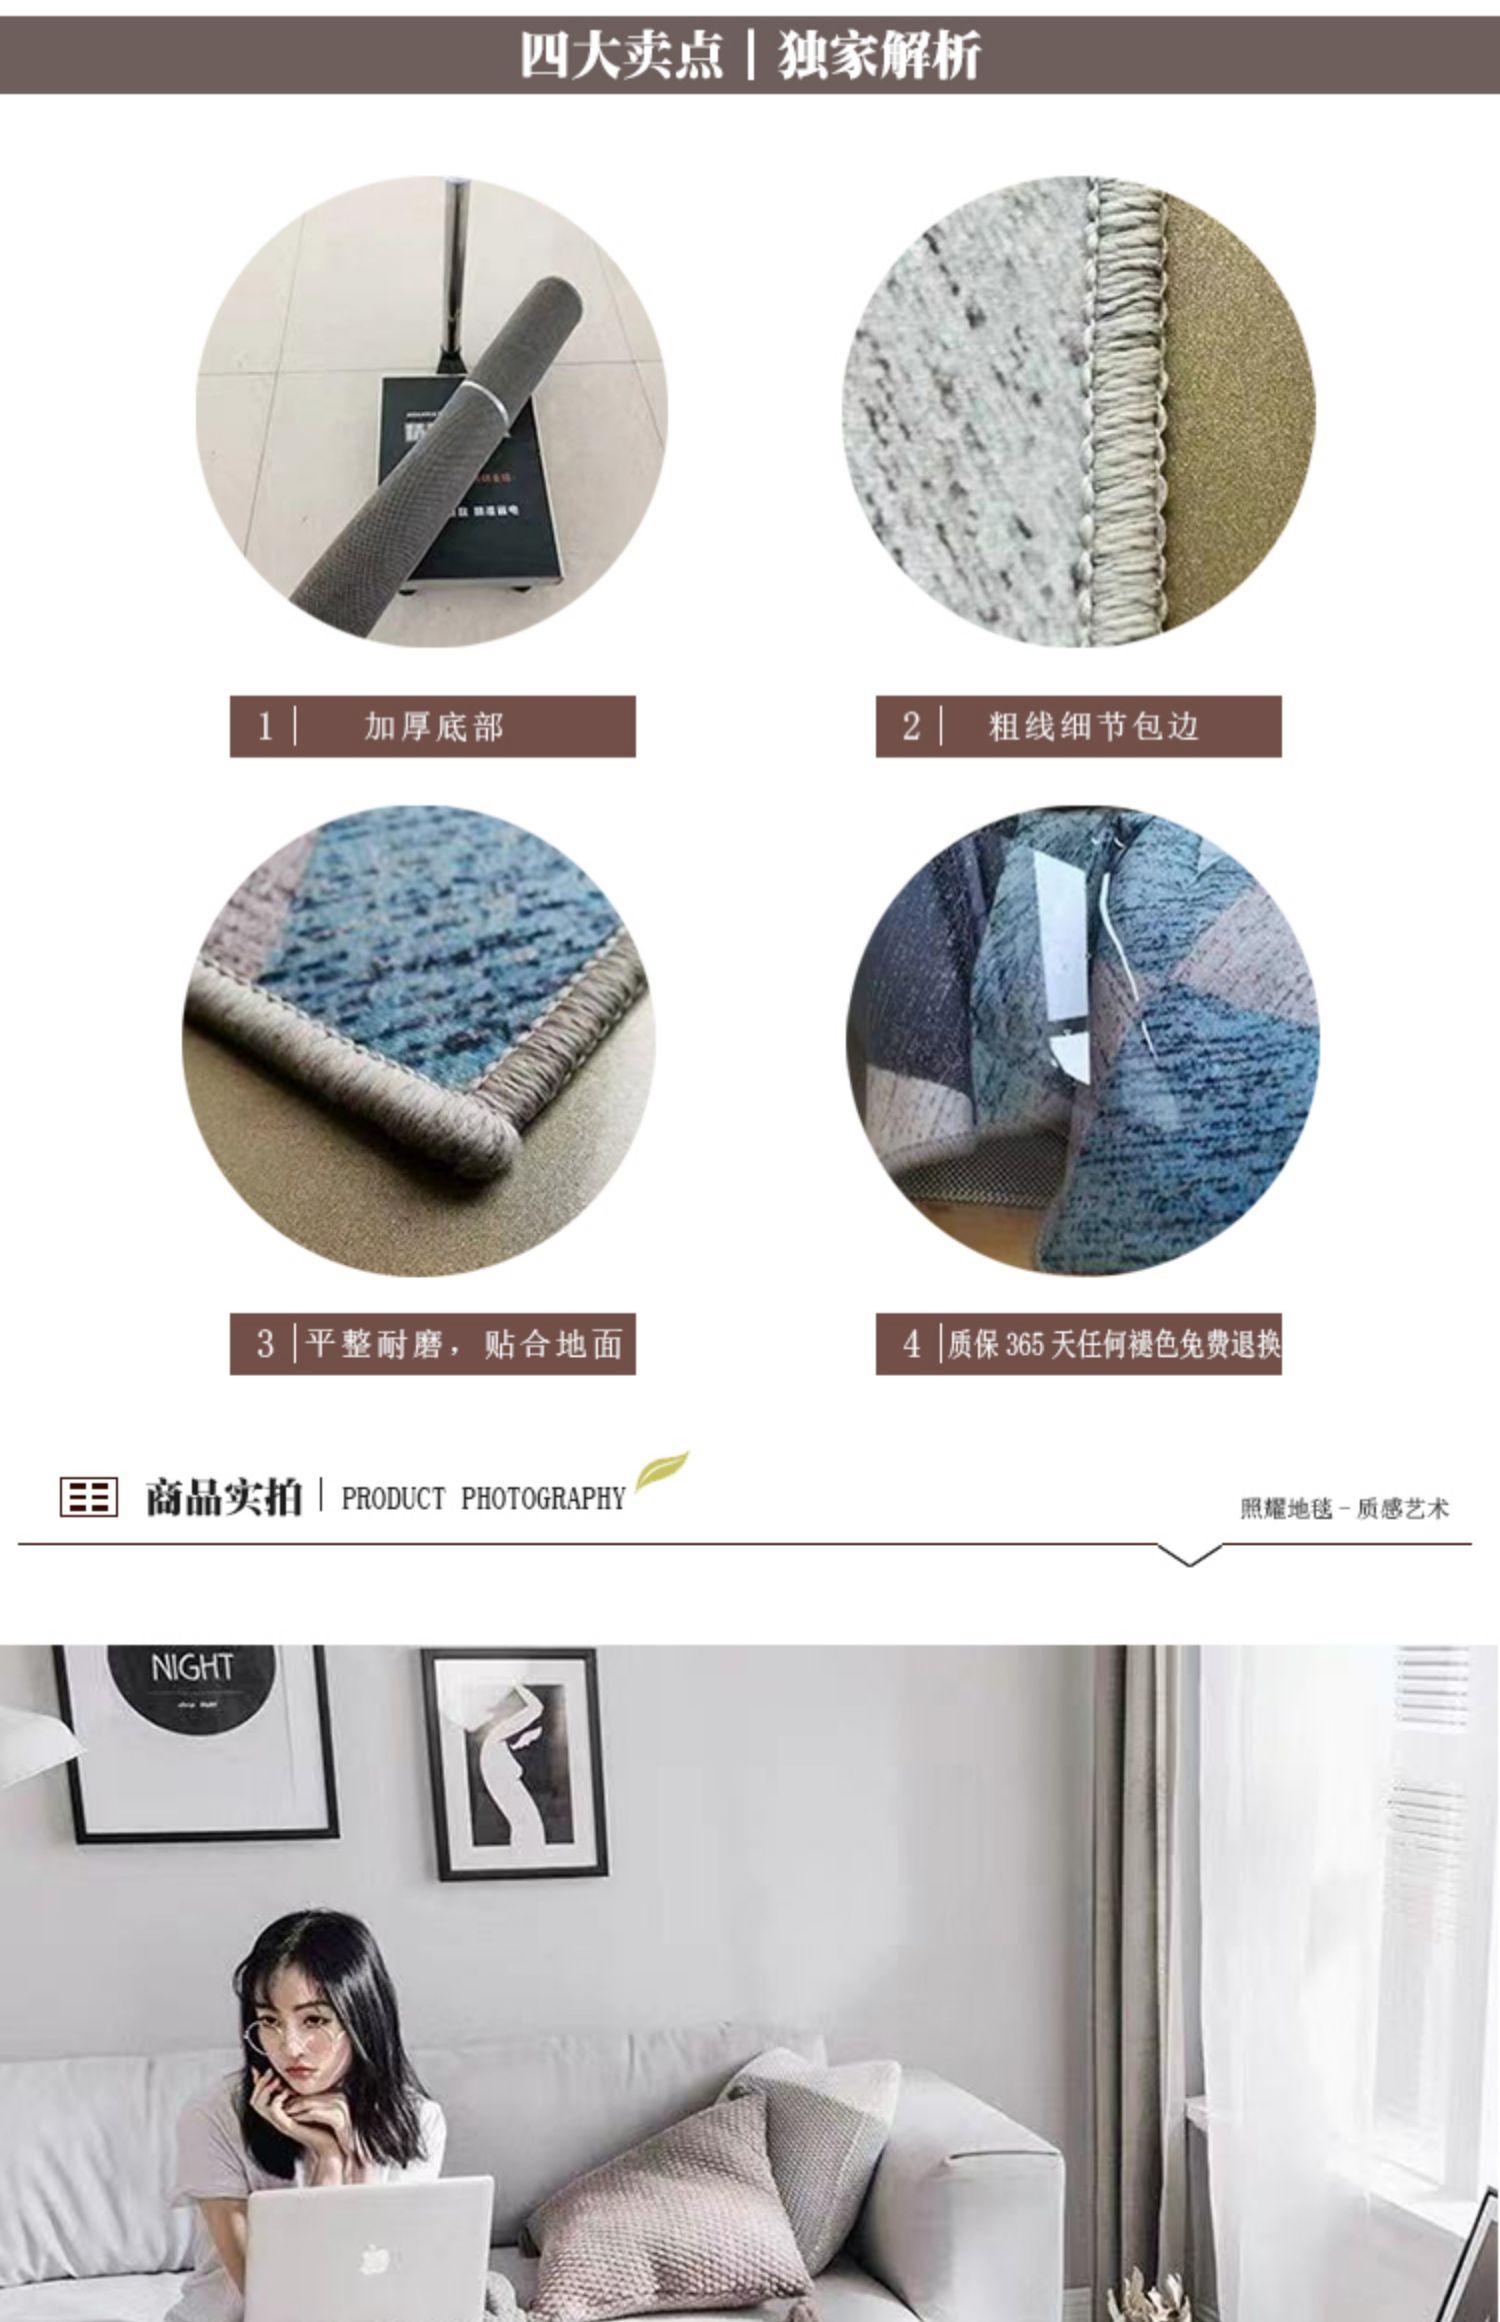 @Warm 北歐風新款客廳地毯茶幾毯家用北歐臥室ins風滿鋪房間床邊簡約定制沙發地墊